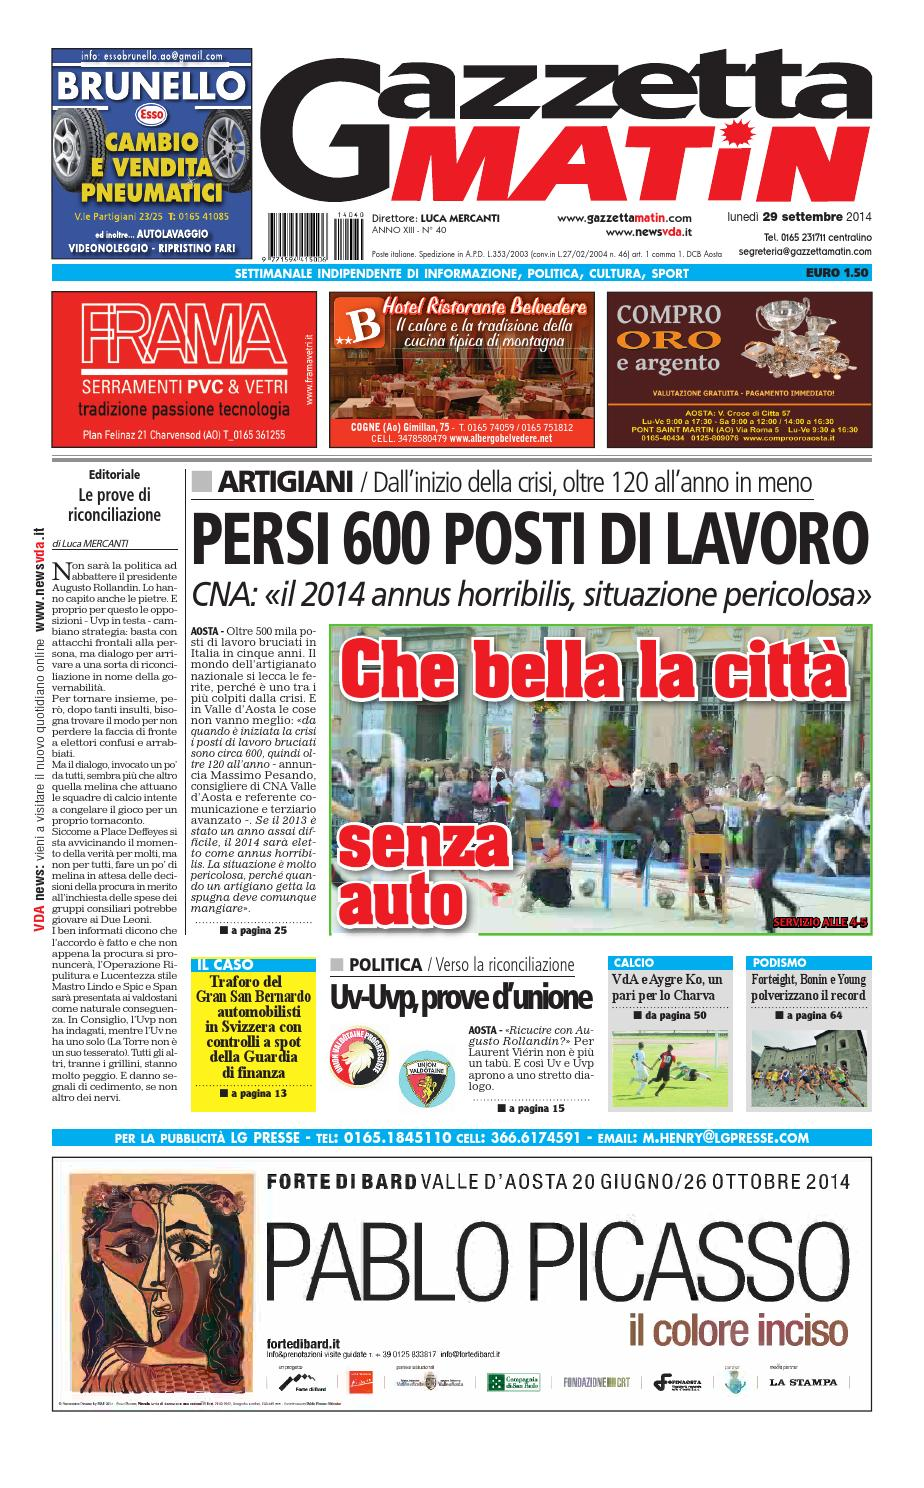 Gazzetta Matin del 29 settembre 2014 by NewsVDA - issuu b2fce8390dc